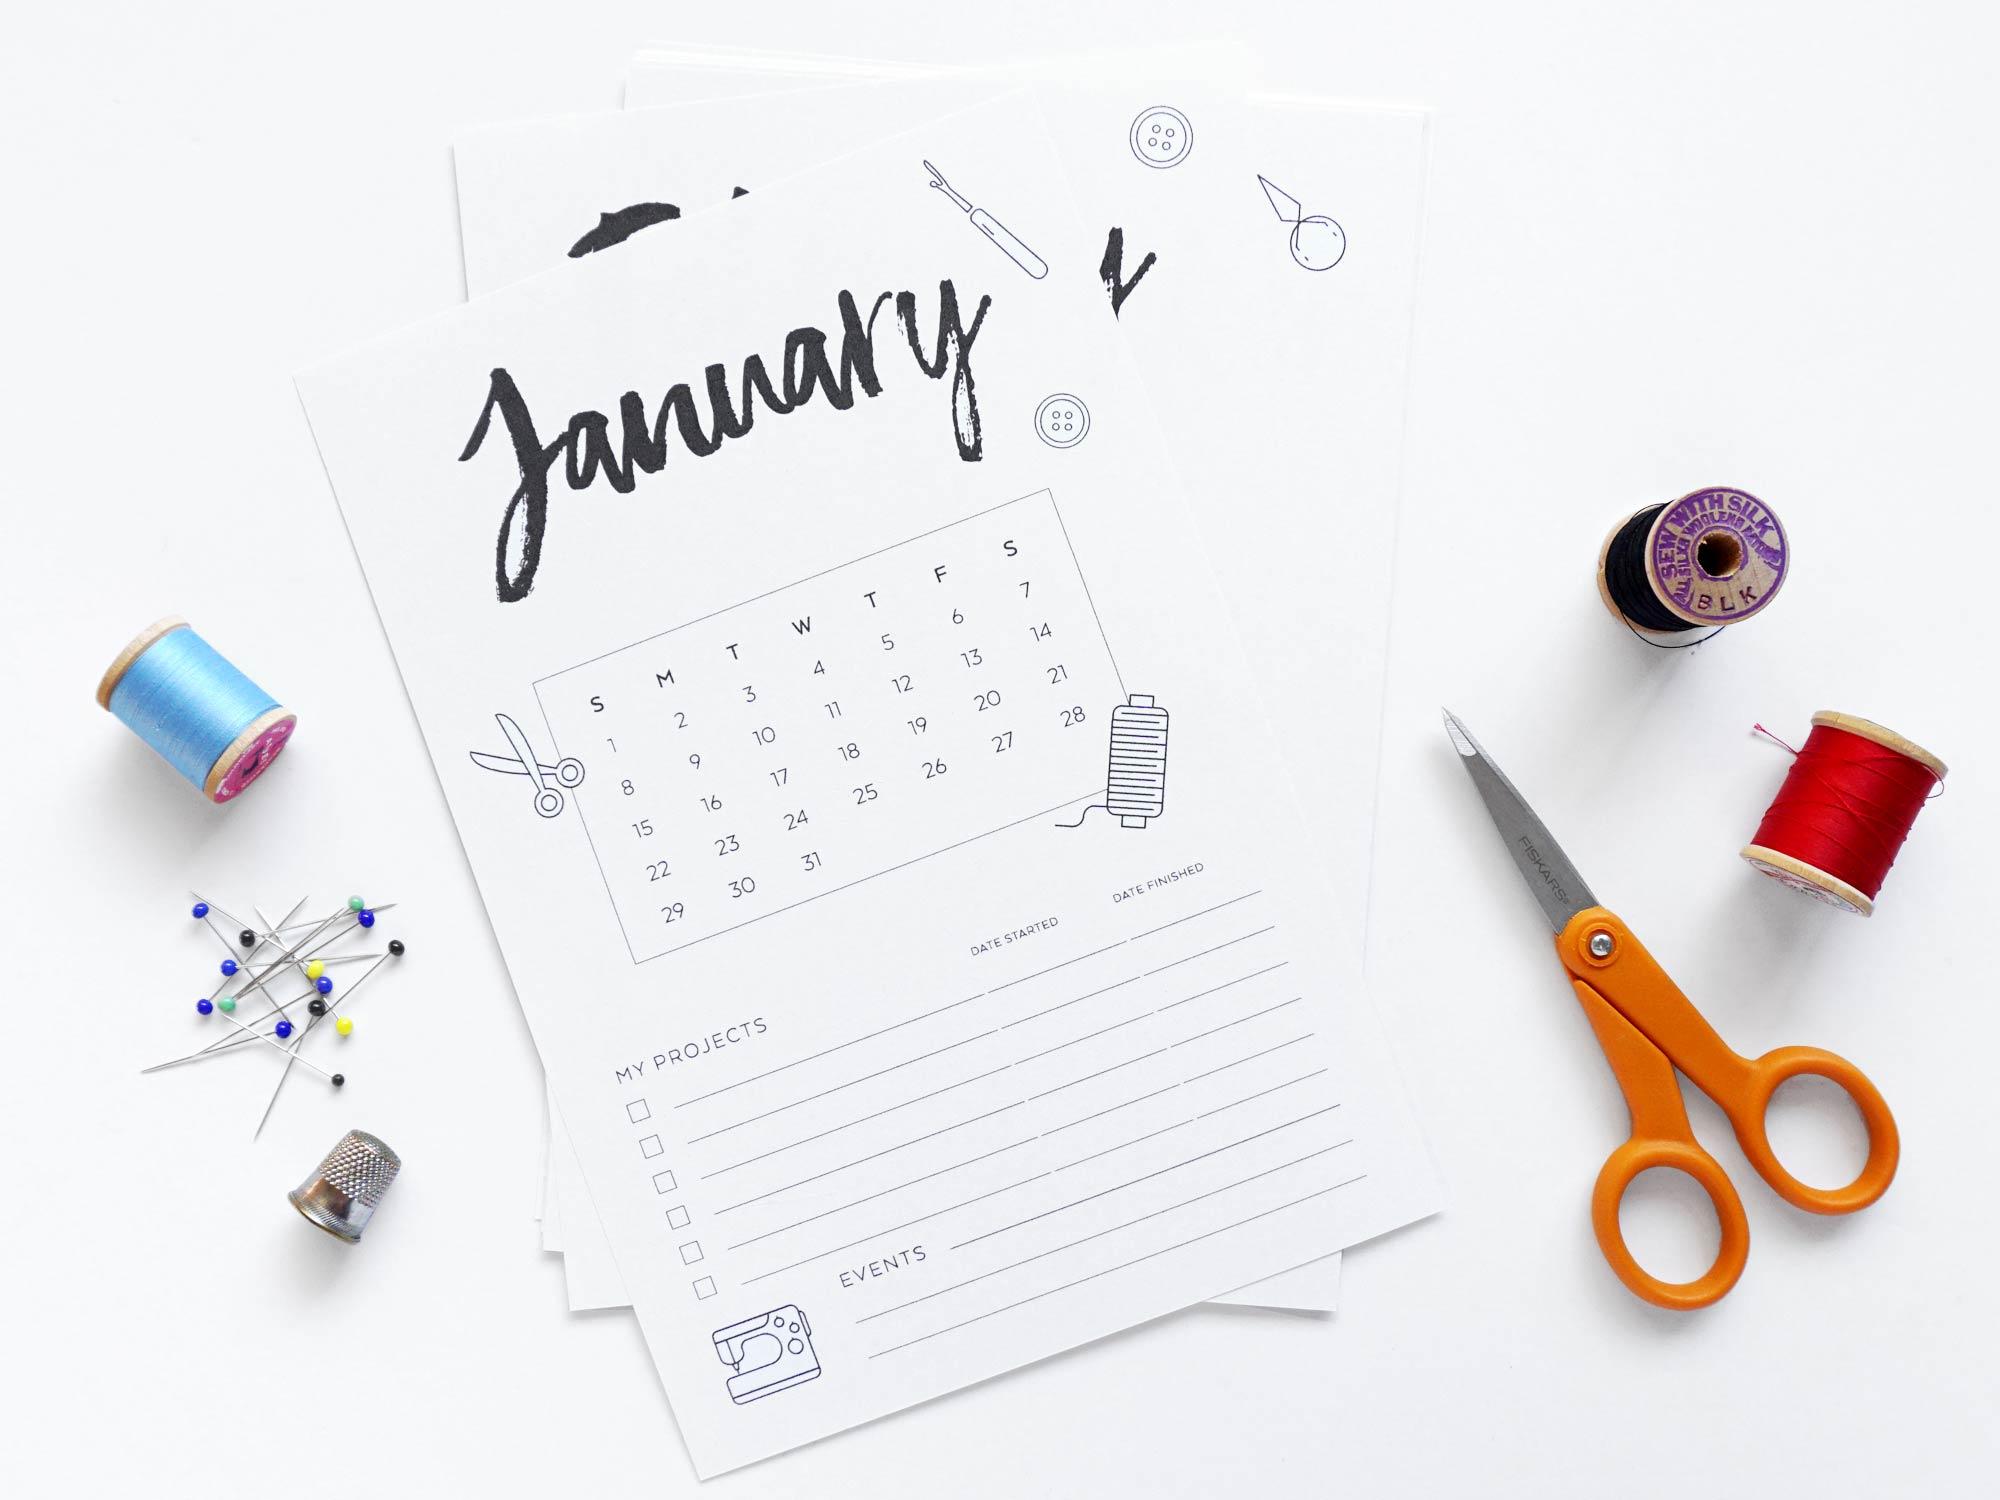 Free DIY Printable 2017 Sewing Calendar | Sew DIY